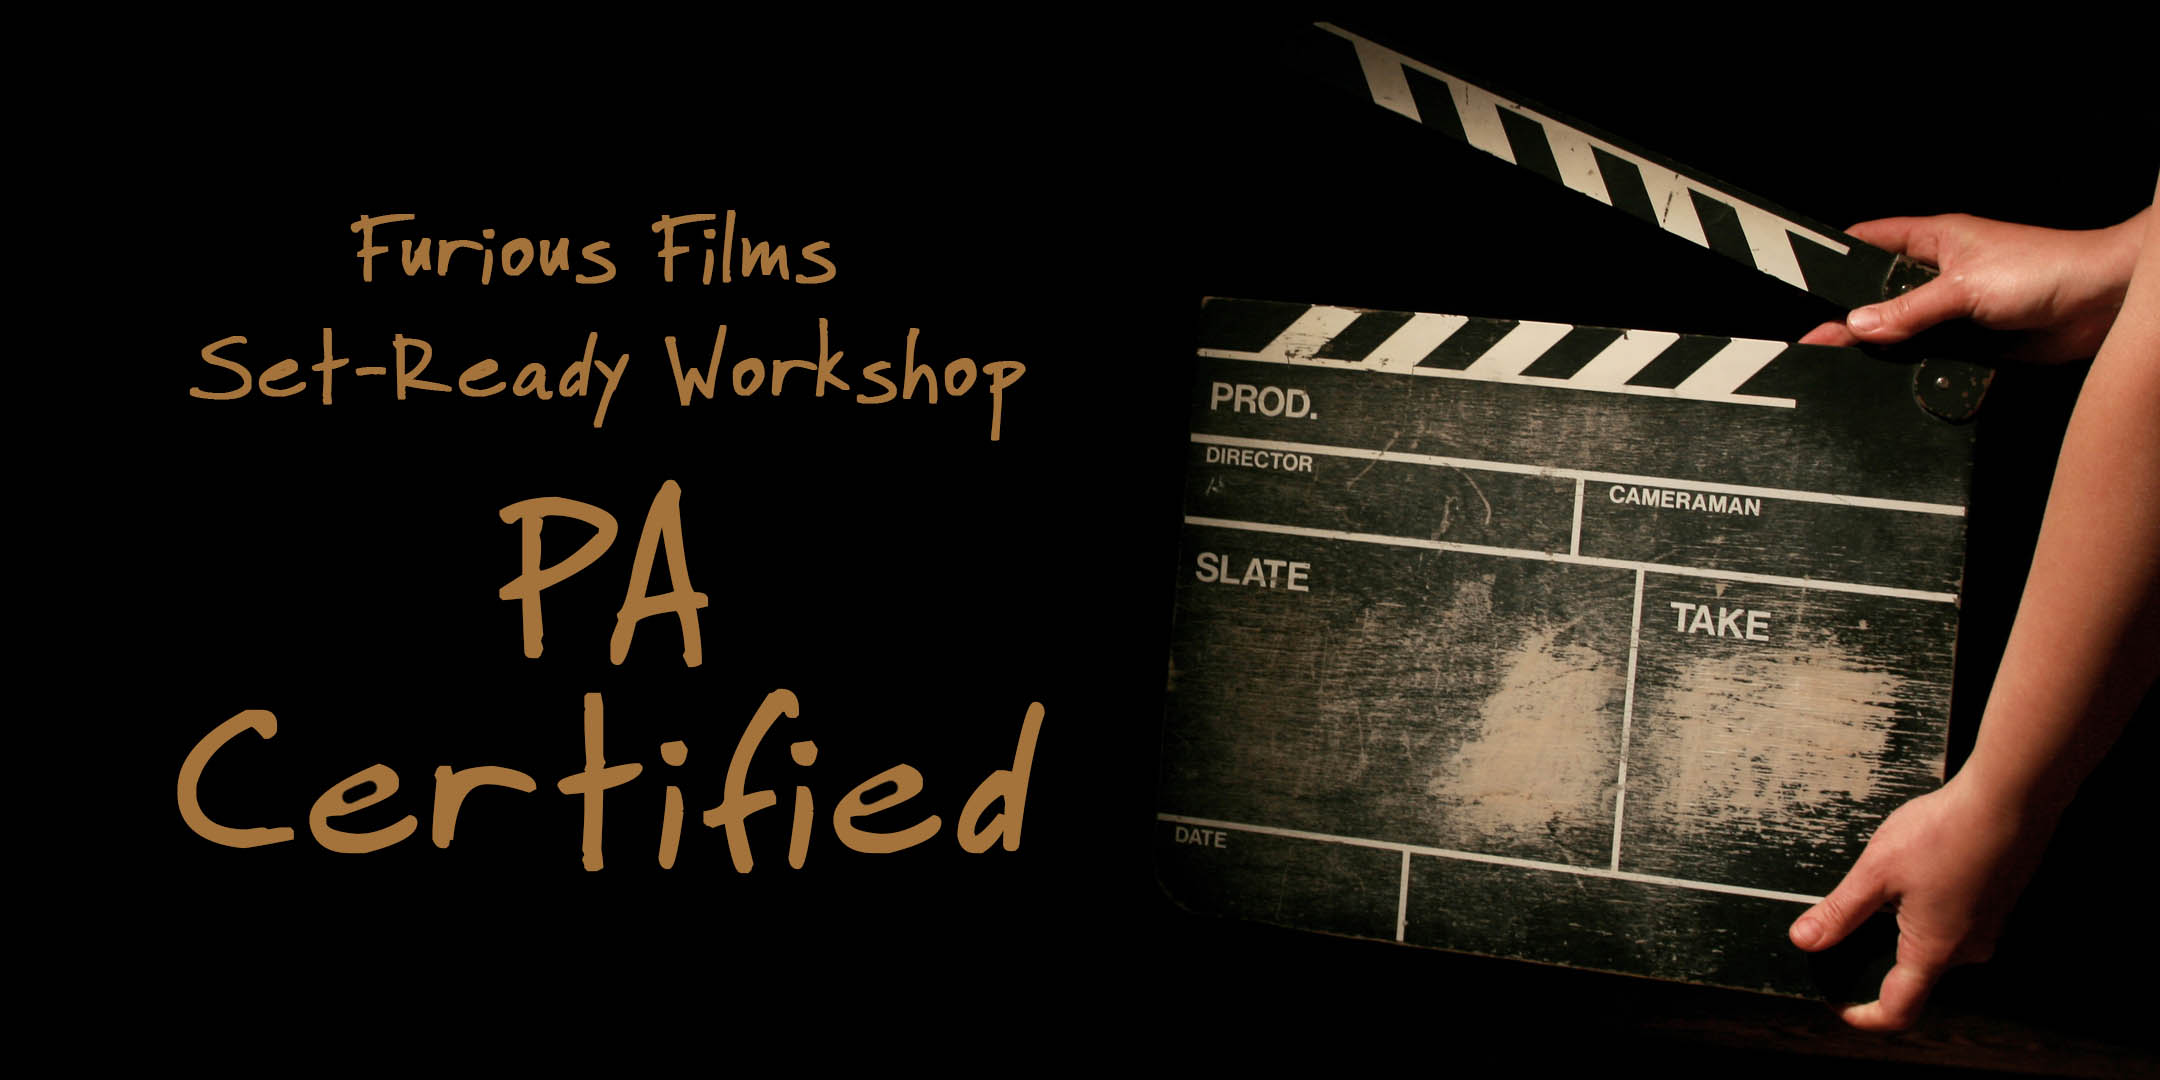 PA Certified